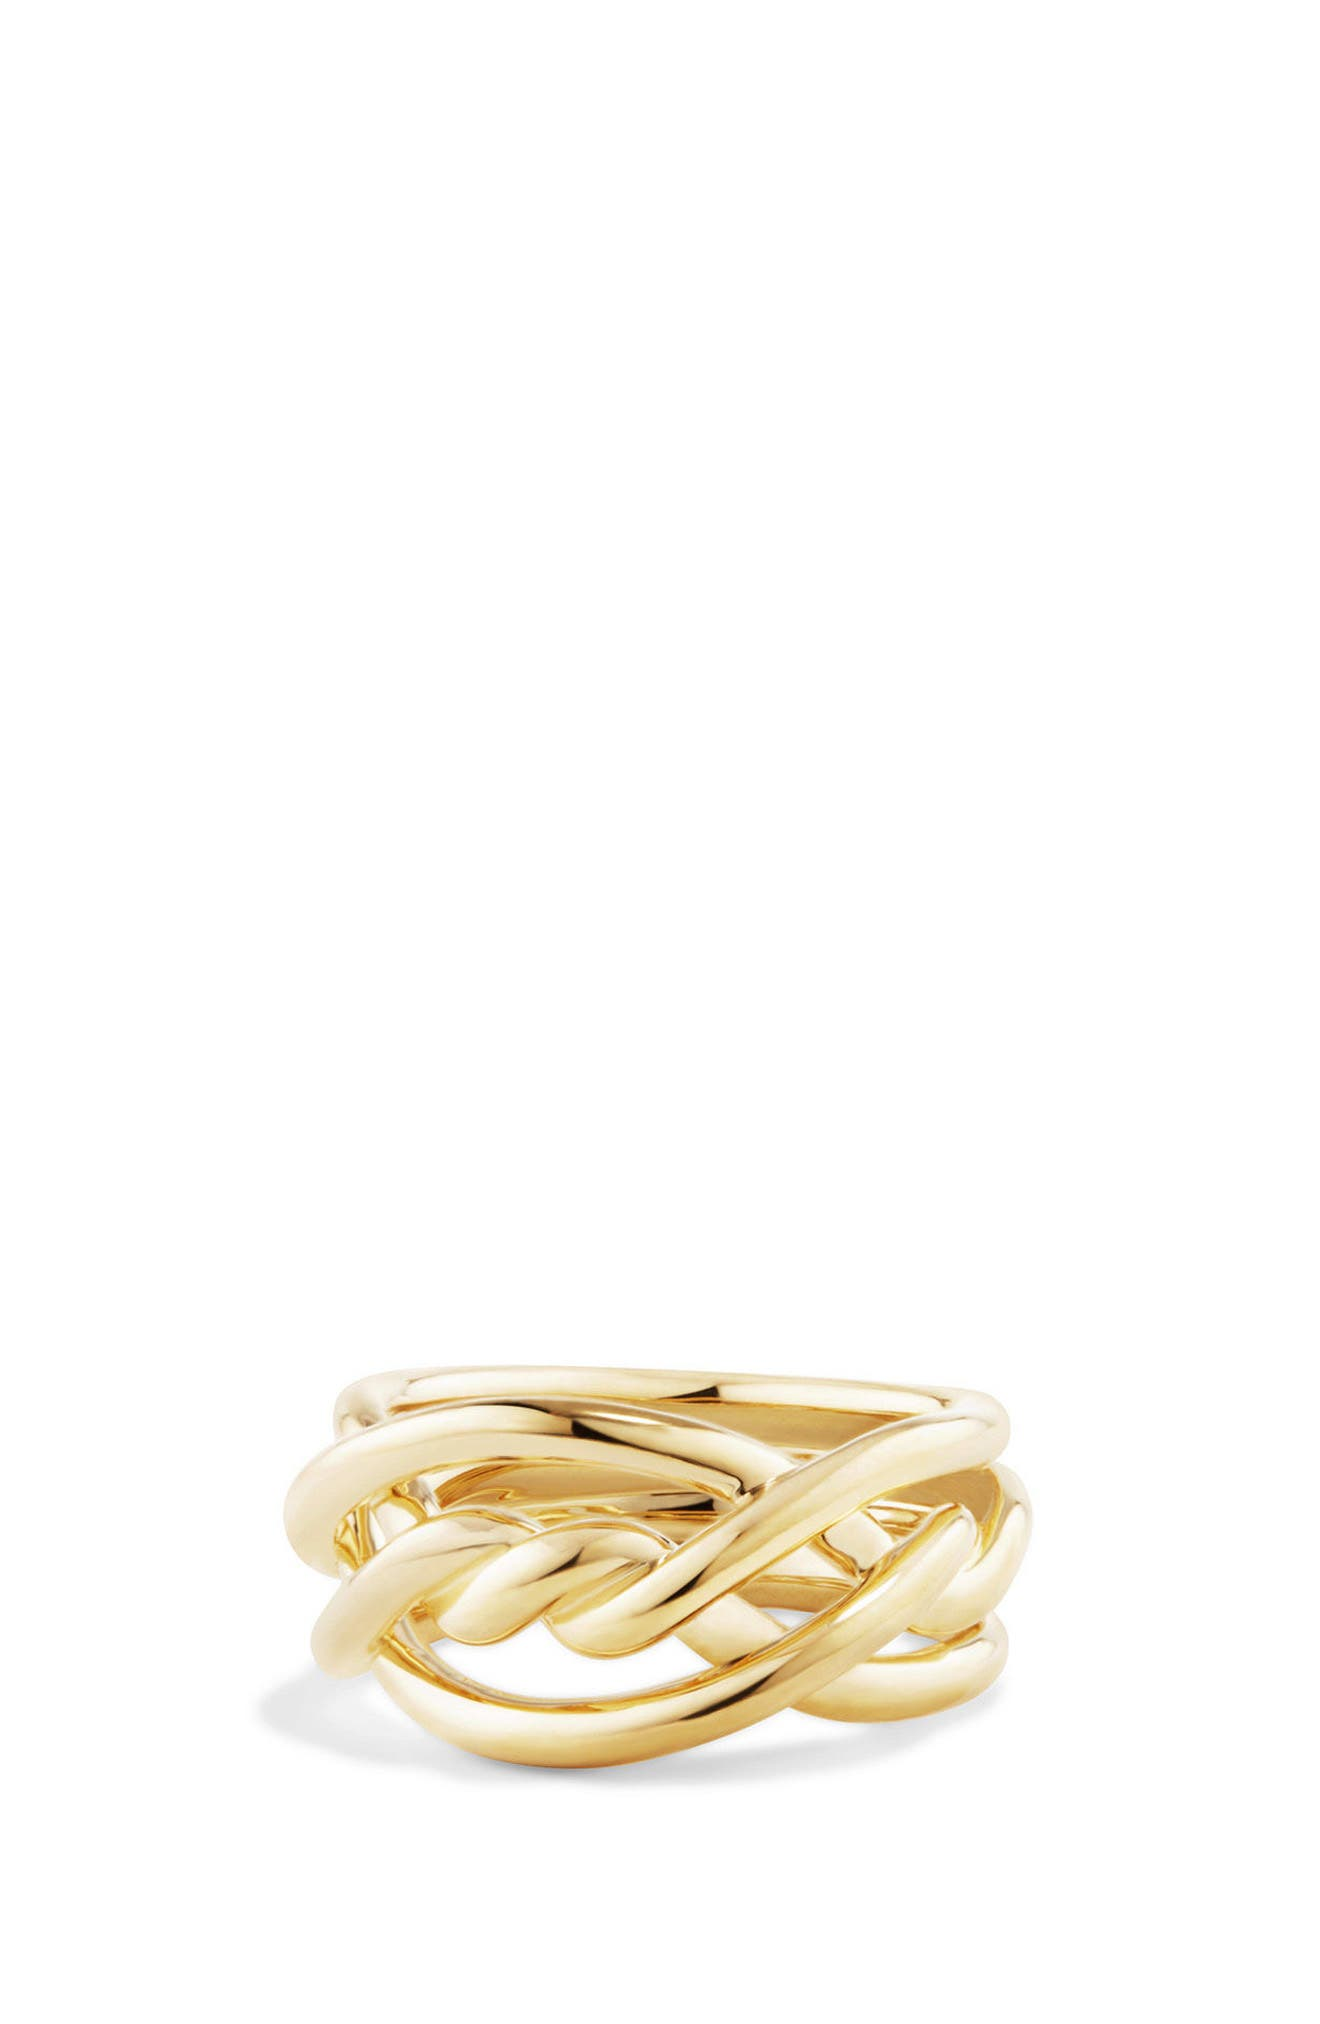 DAVID YURMAN Continuance Ring in 18K Gold